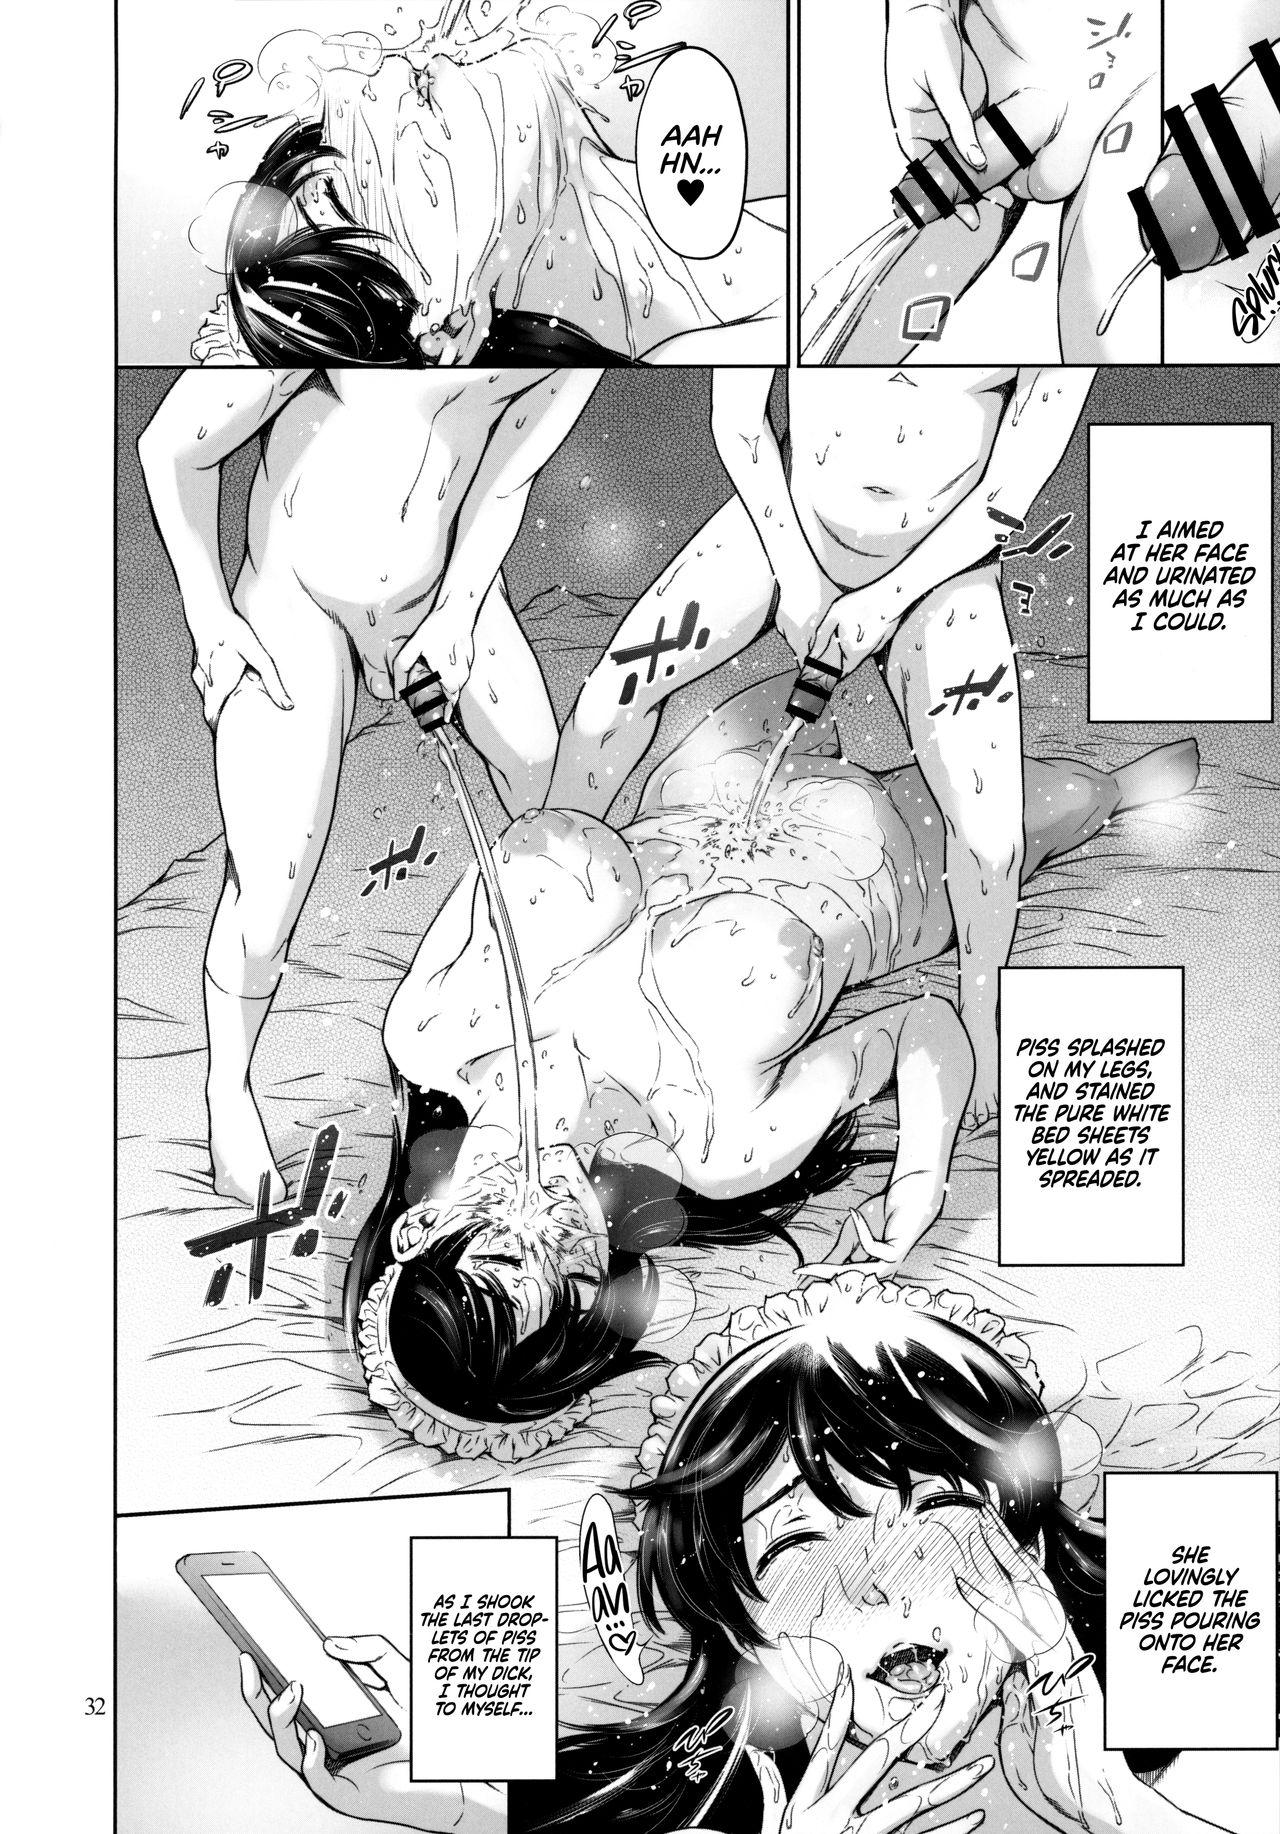 Uchi no Maid   My Housemaid 30